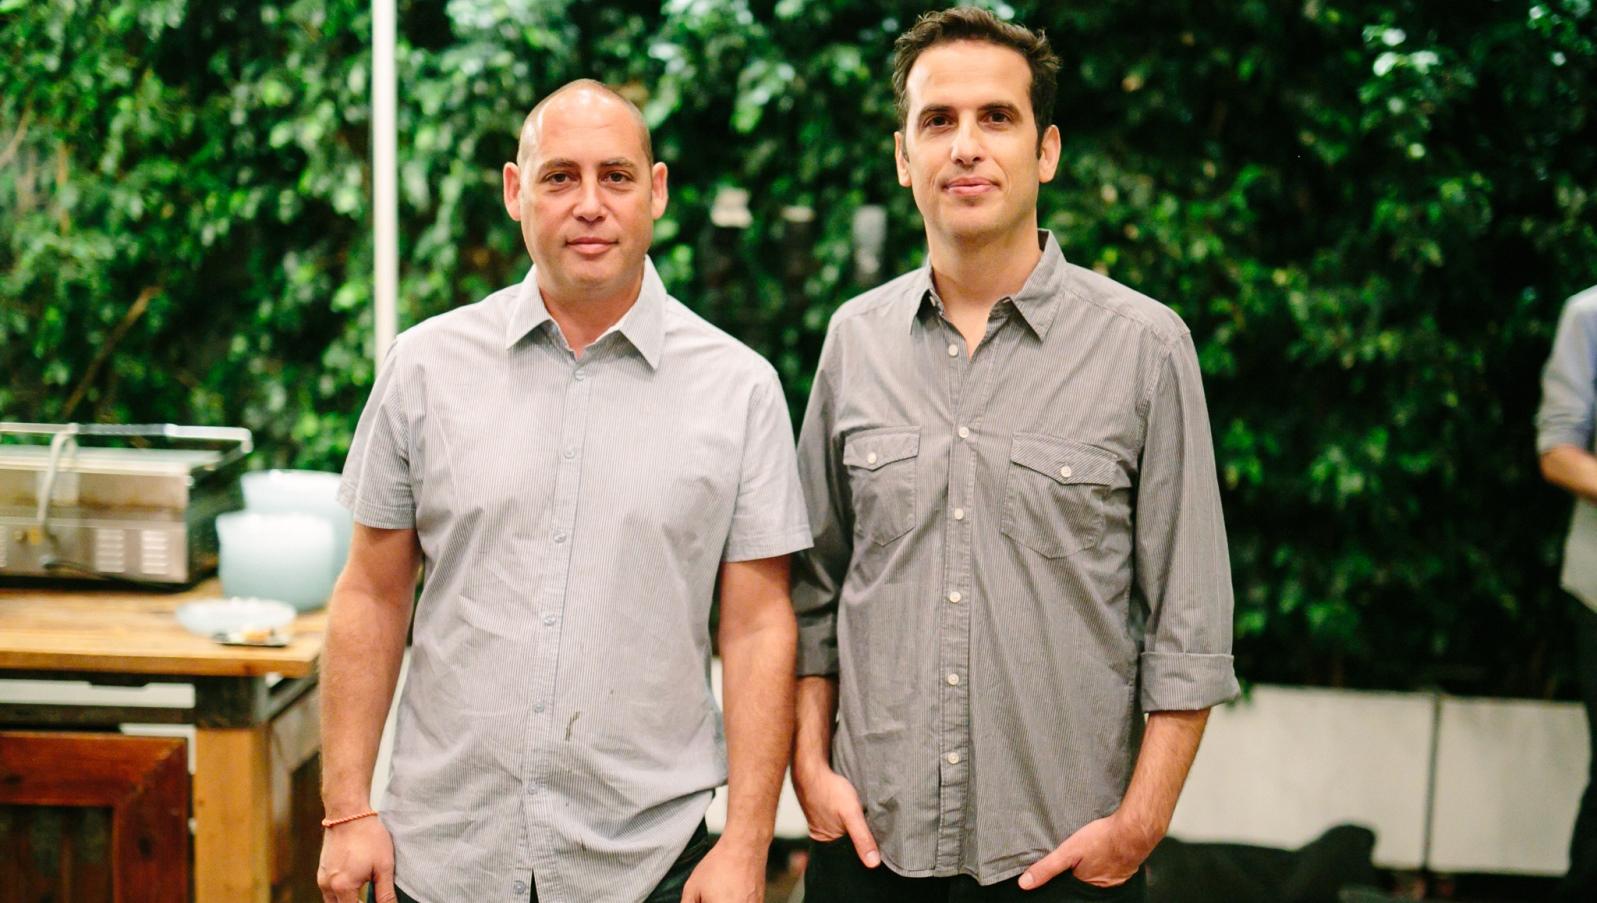 examPAL cofounders Oren Jackman and Ben Peer. Photo by Noa Magger